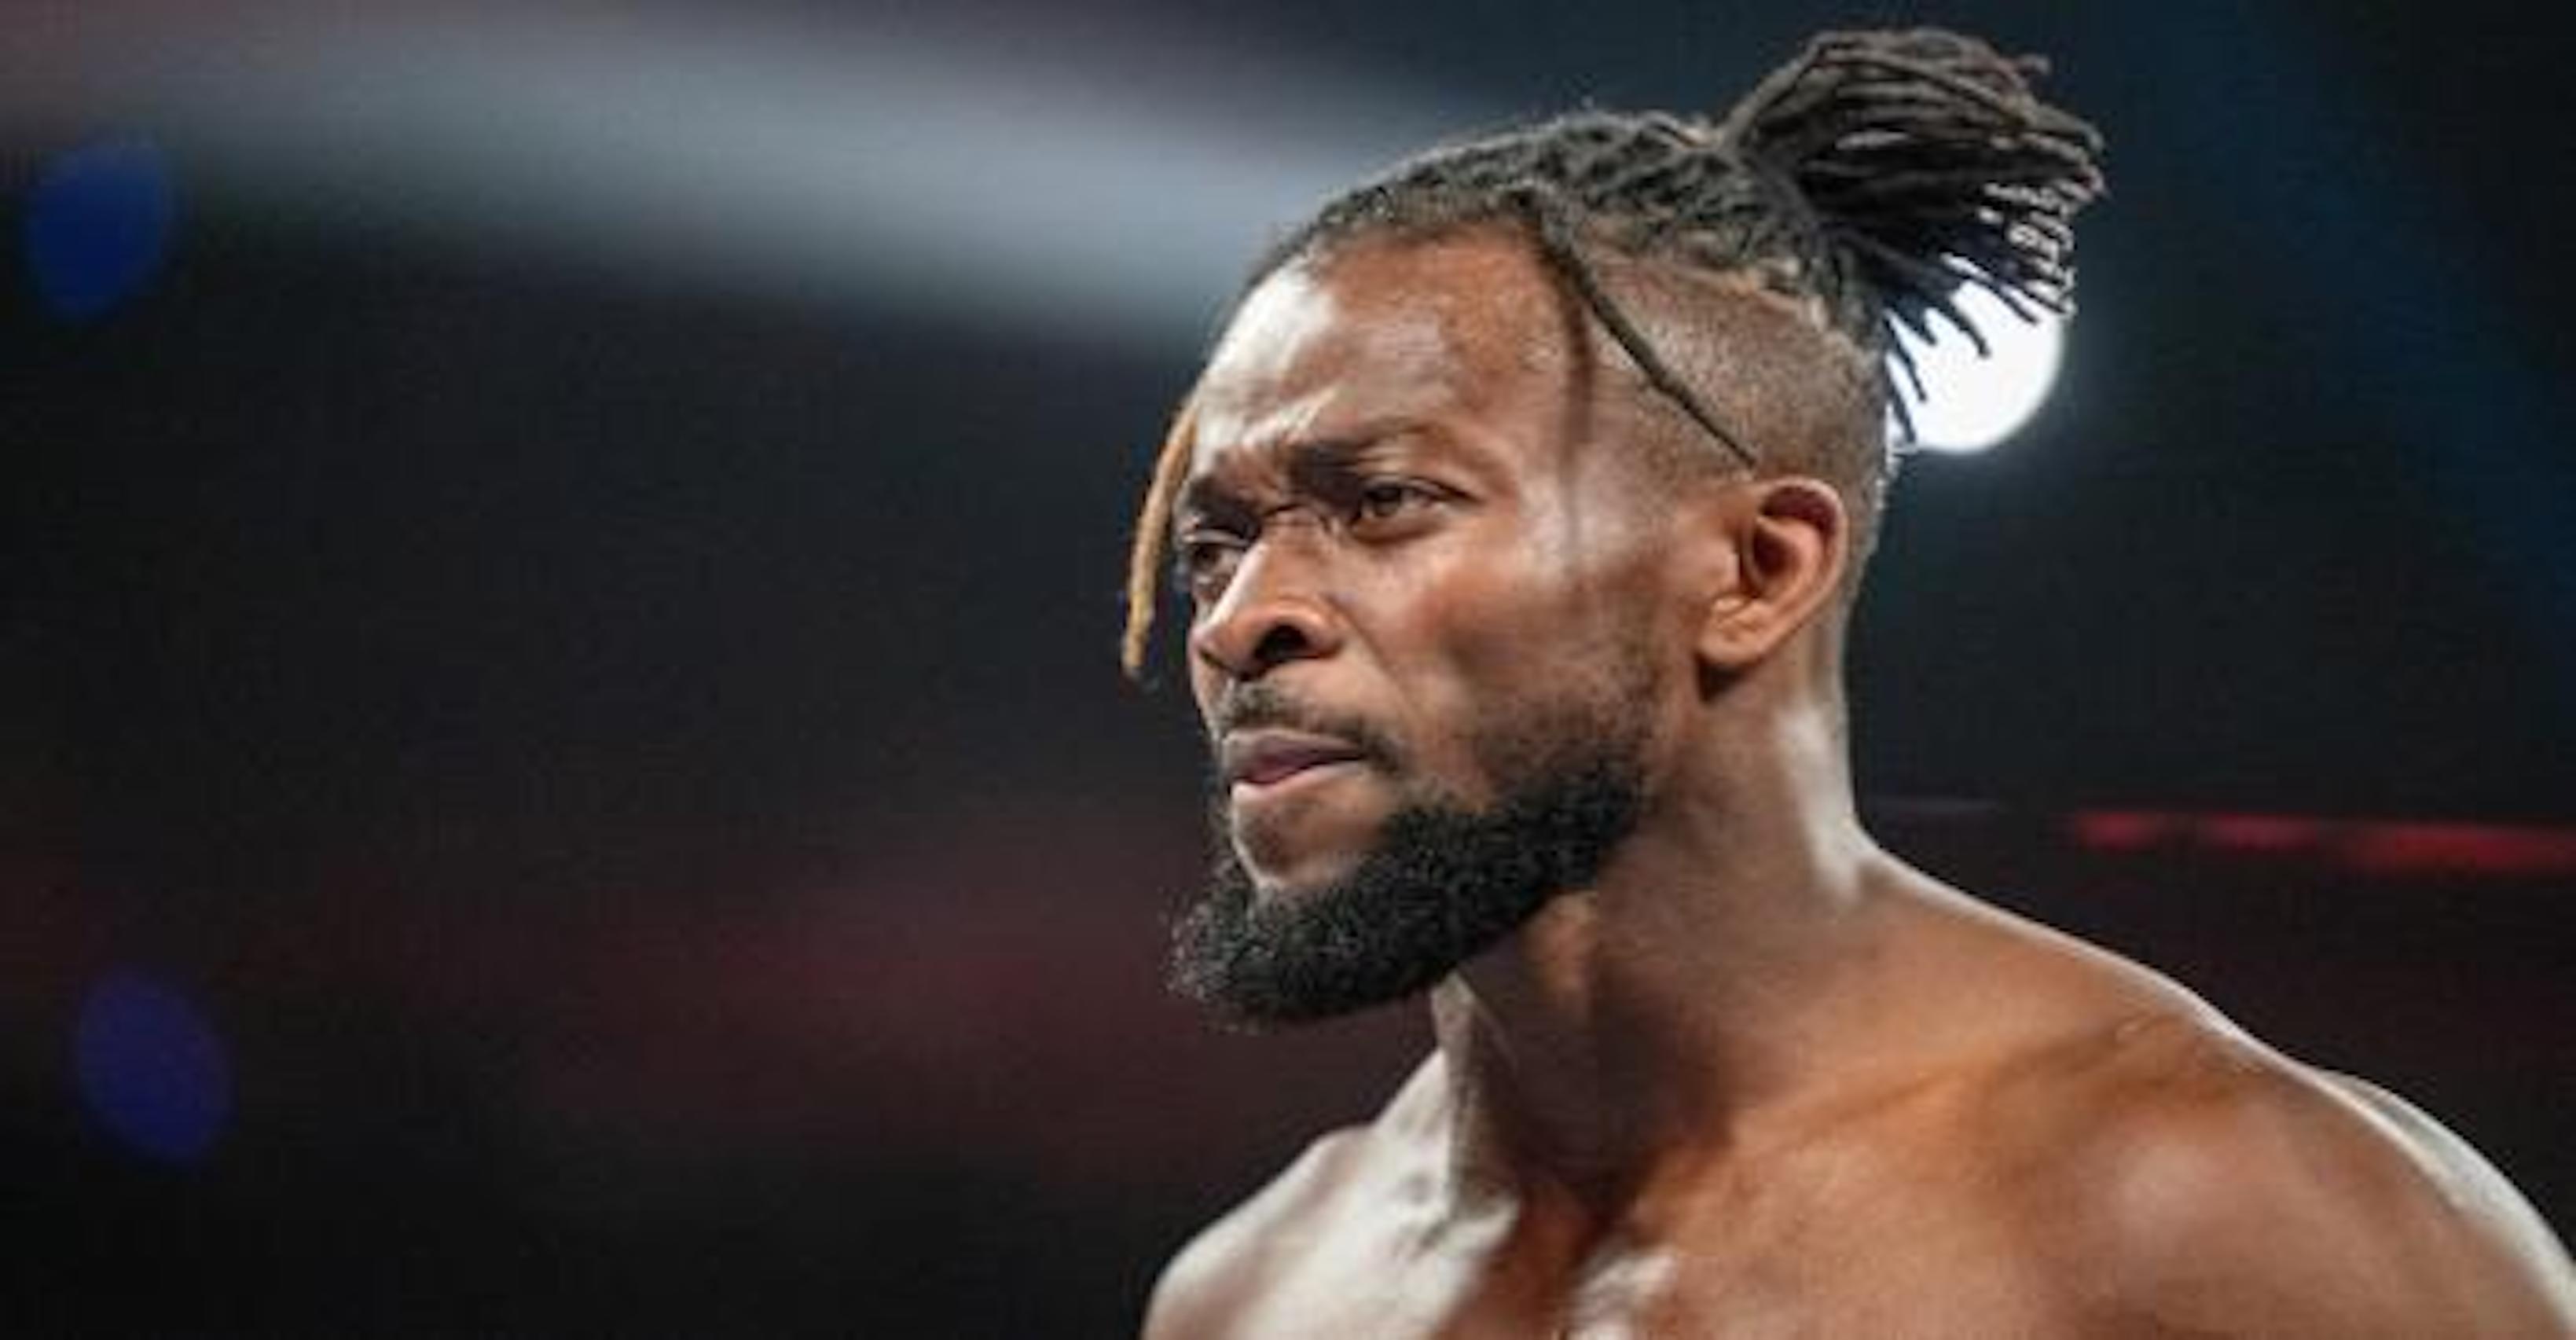 Was Kofi Kingston's WWE Title Run Tarnished After 'SmackDown' Loss To Brock Lesnar?